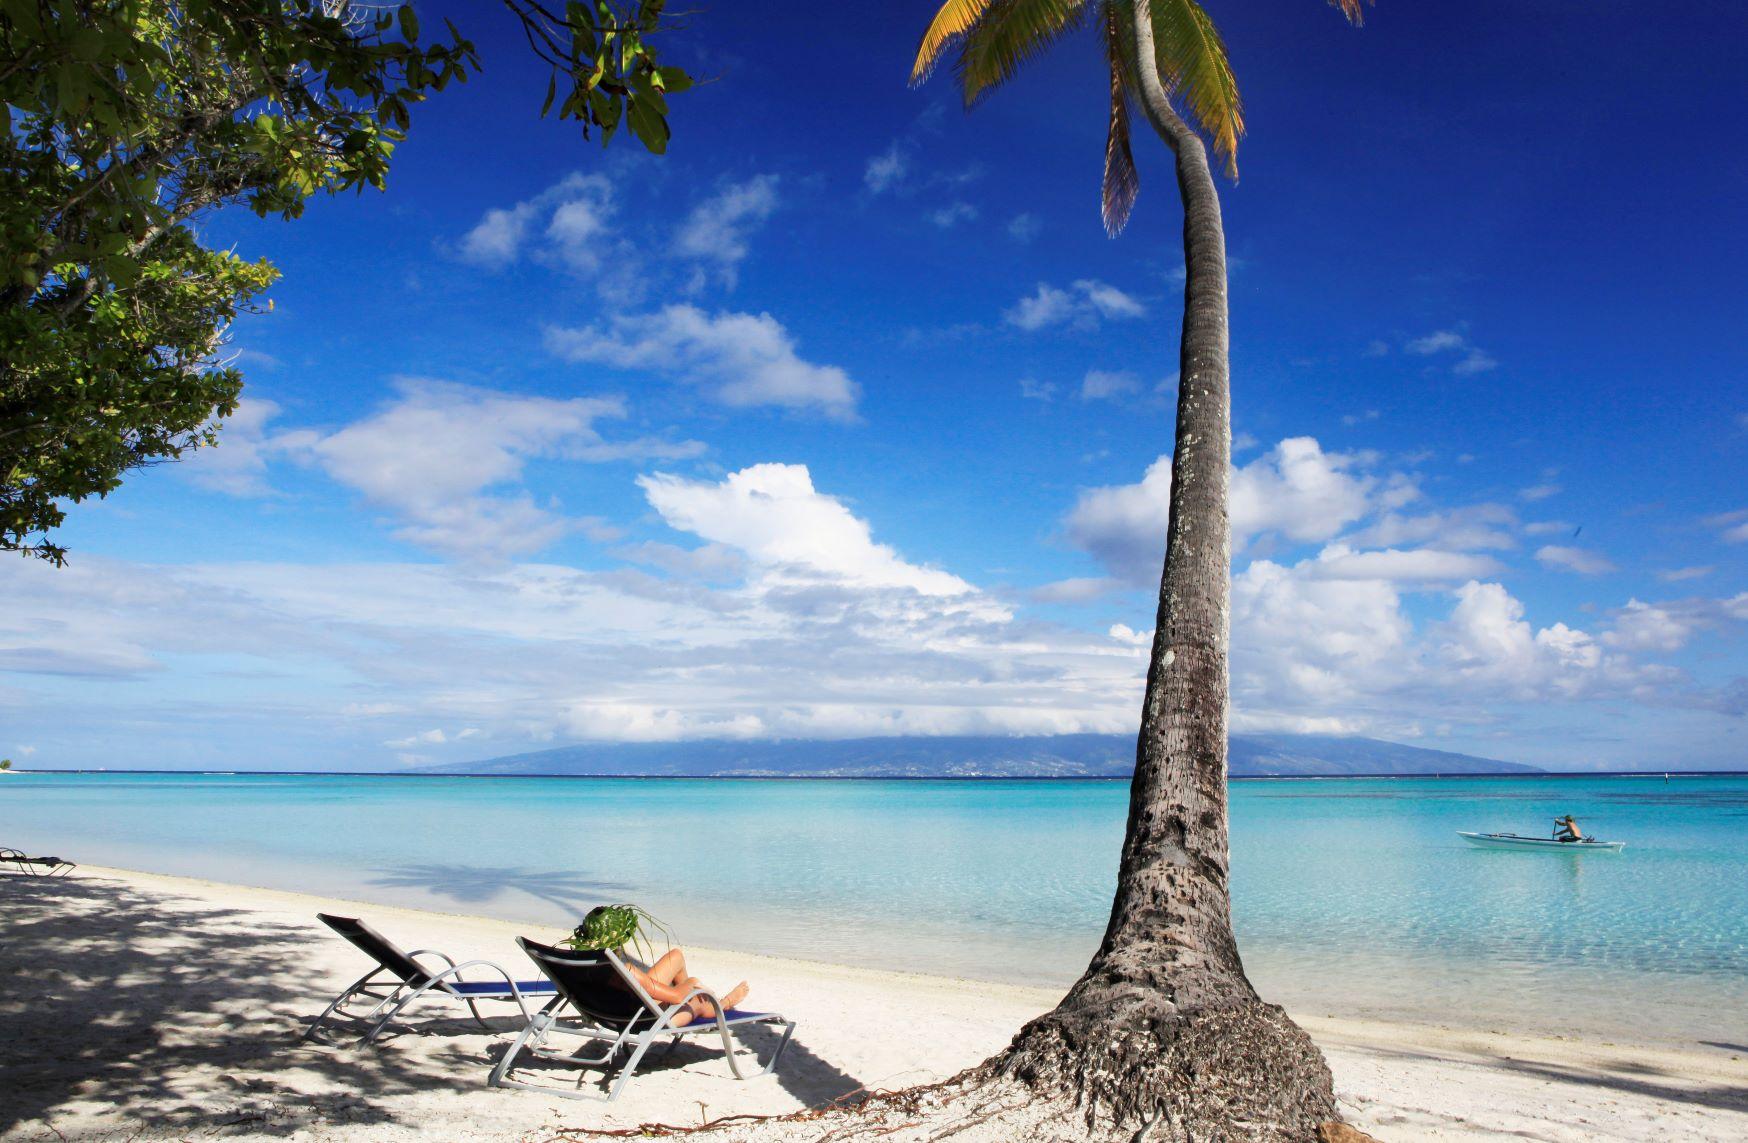 https://tahititourisme.fr/wp-content/uploads/2020/10/Sofitel-Moorea-Ia-Ora-Relaxing-on-the-Beach.jpg